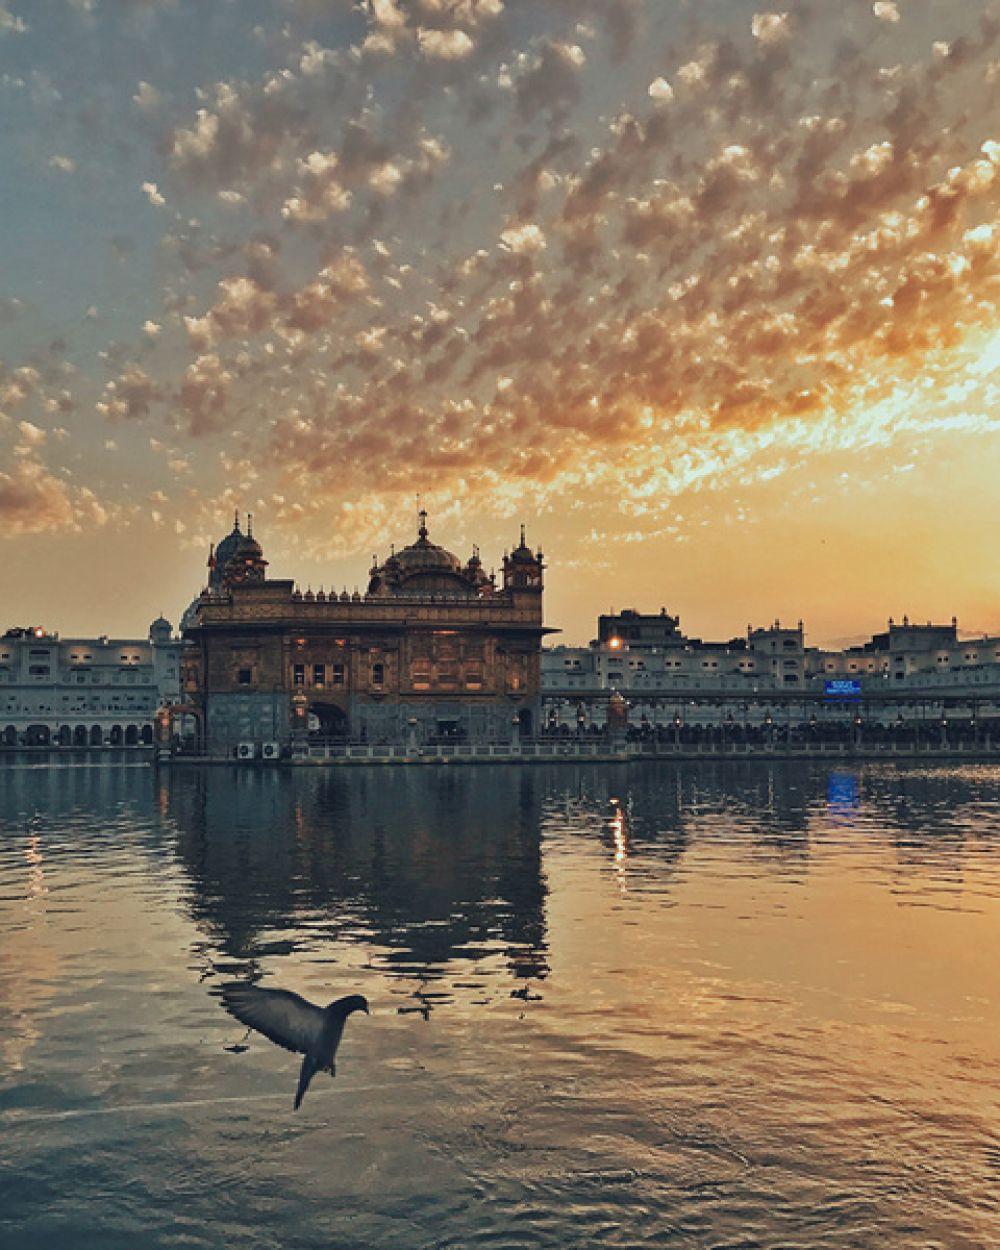 1 место в категории «Закат» — Закат и Золотой храм в Амритсаре, Индия.